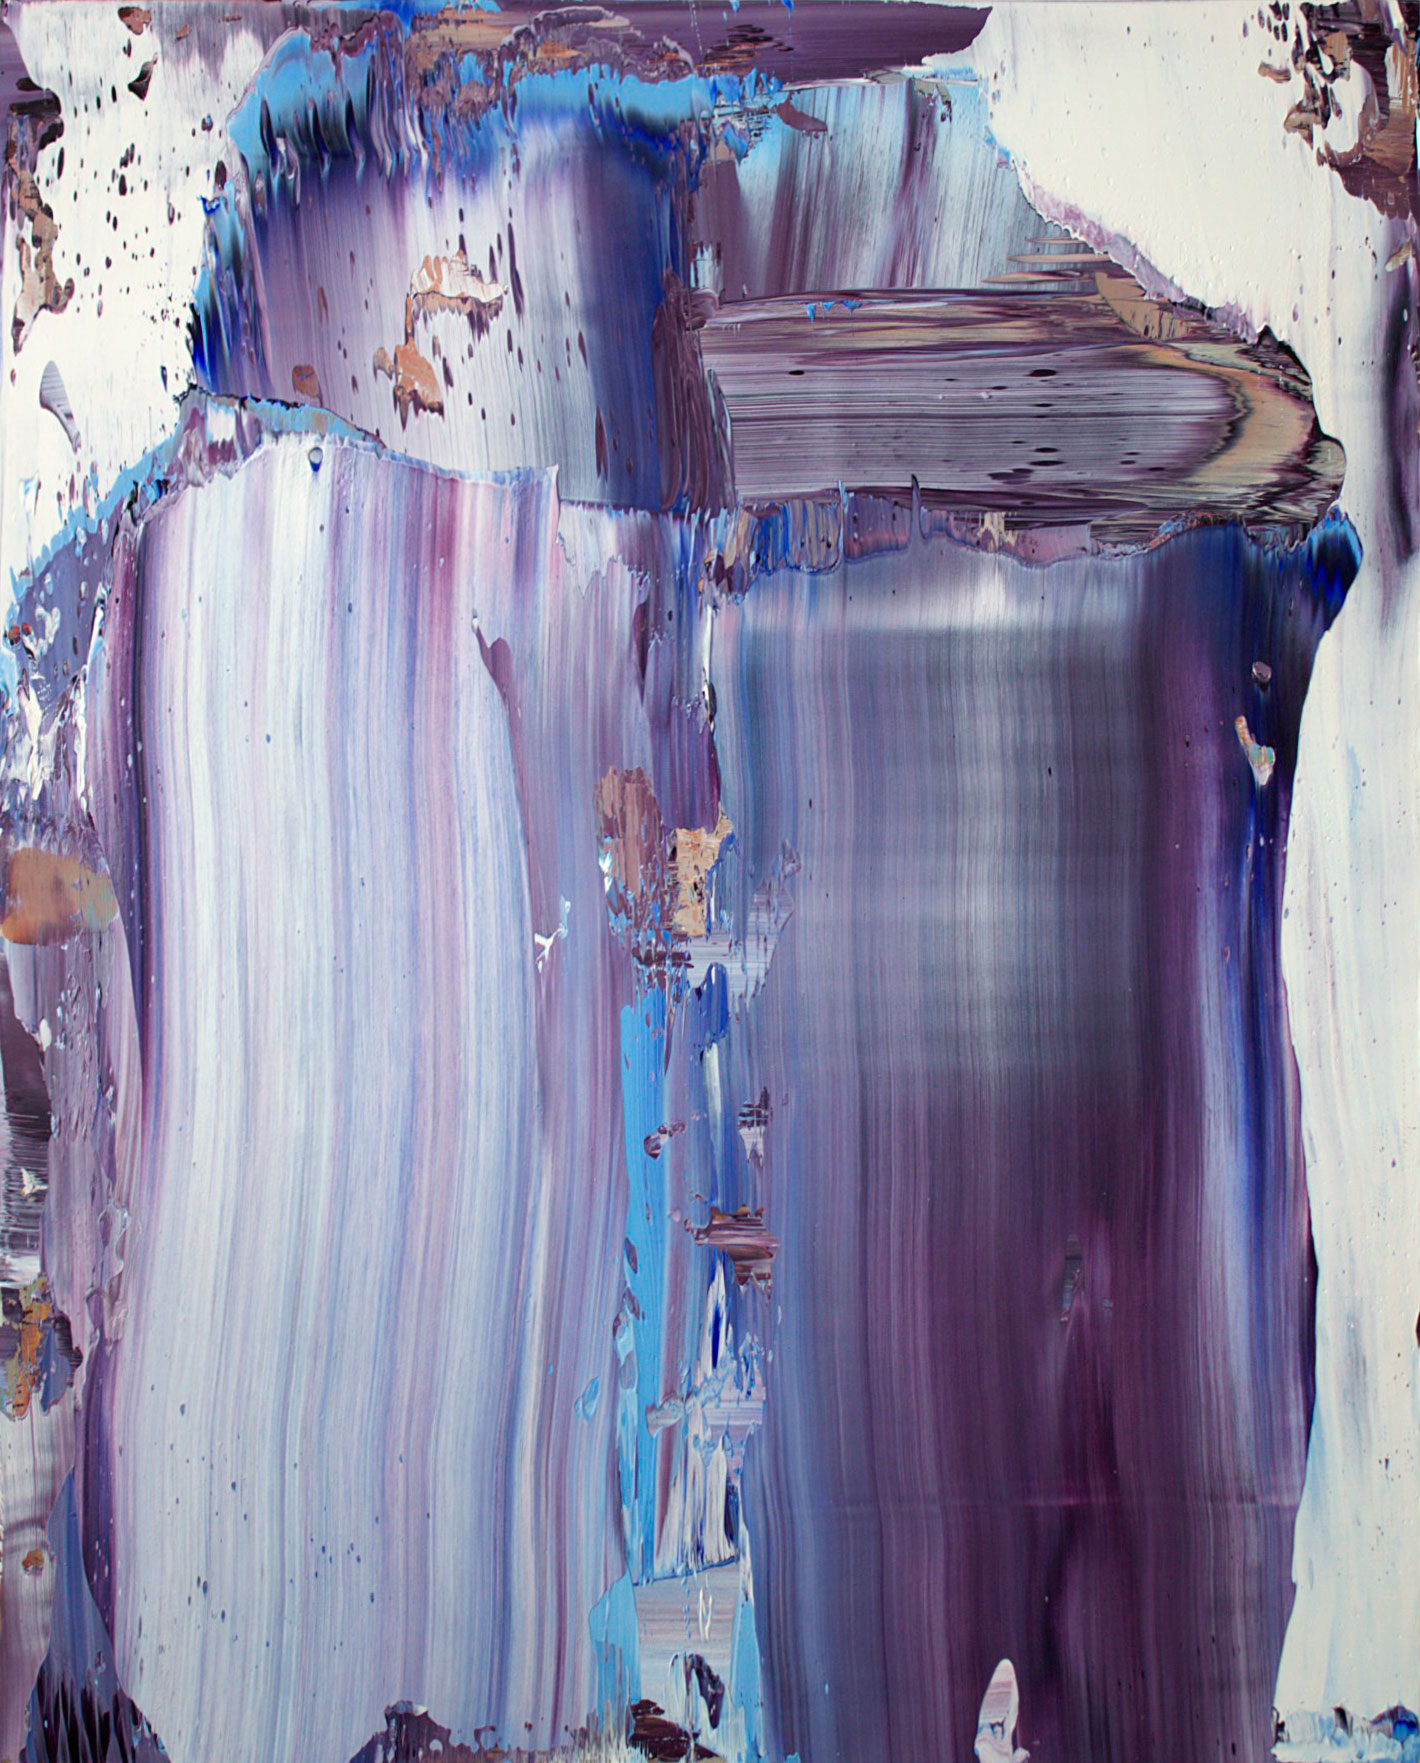 """Iris (March 31, 2014)"" oil on panel 30"" x 24."""